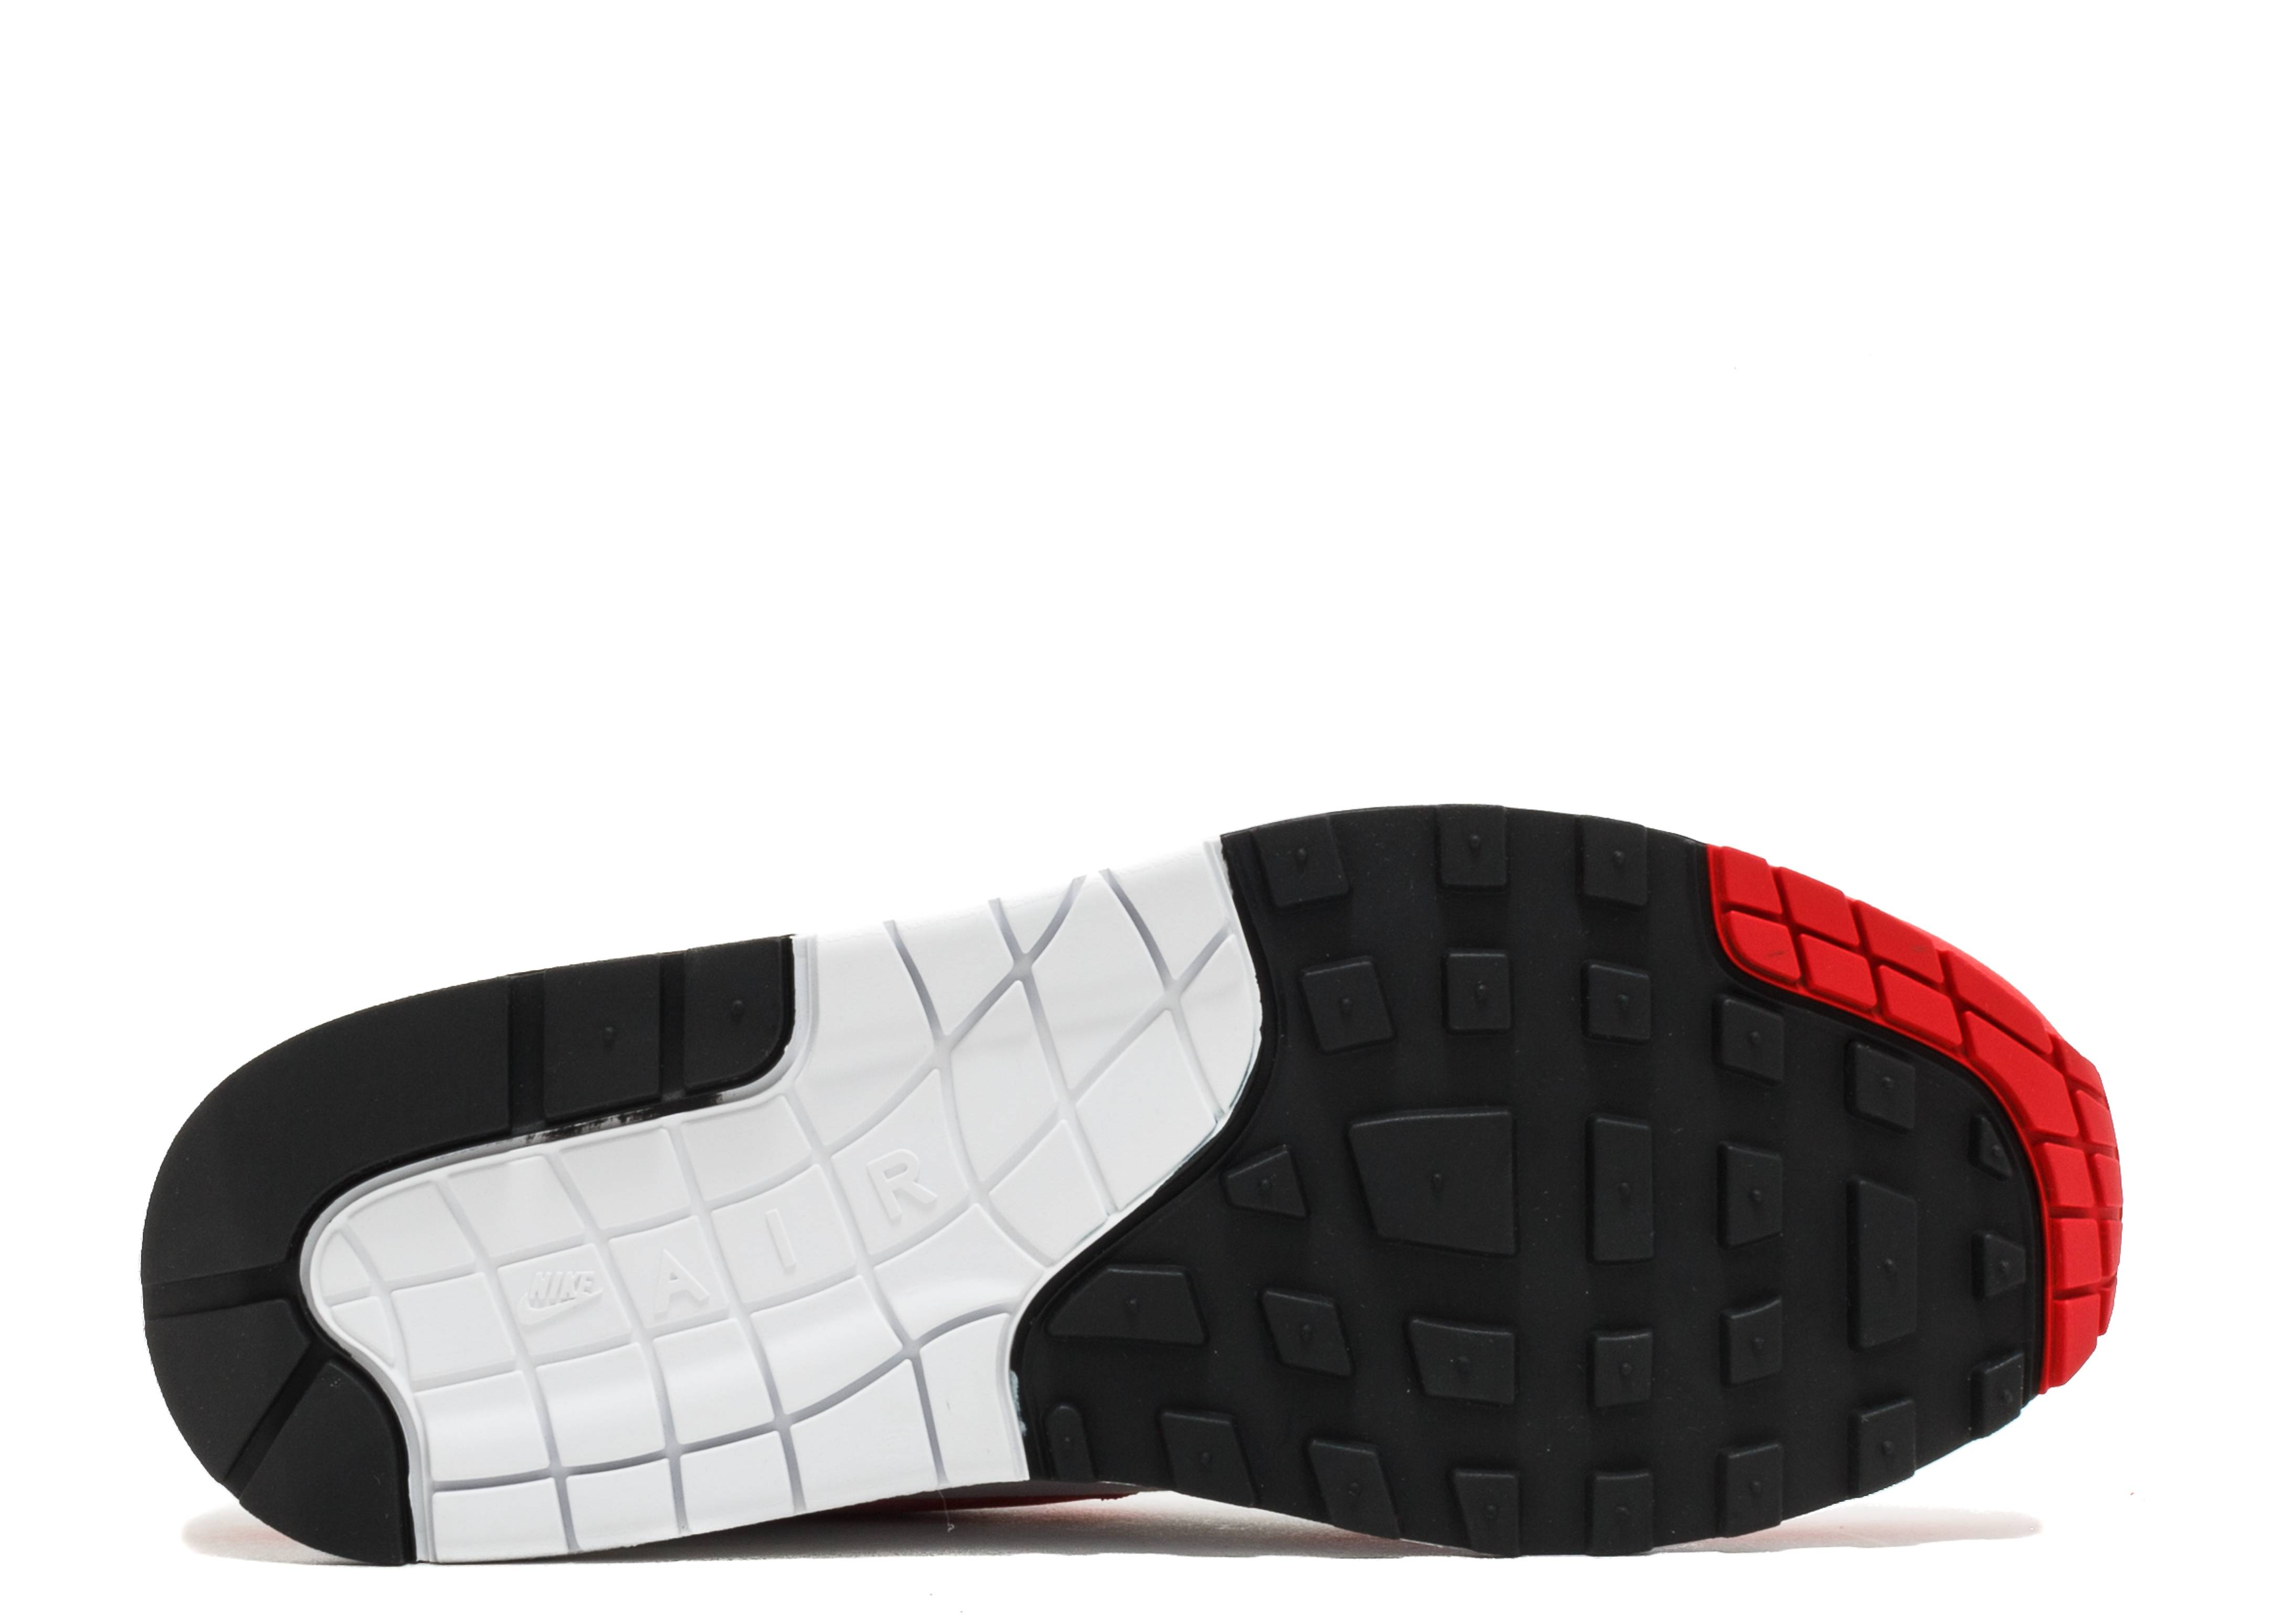 397645b4099c2a Nike Air Max 1 Anniversary - Nike - 908375 103 - white university red